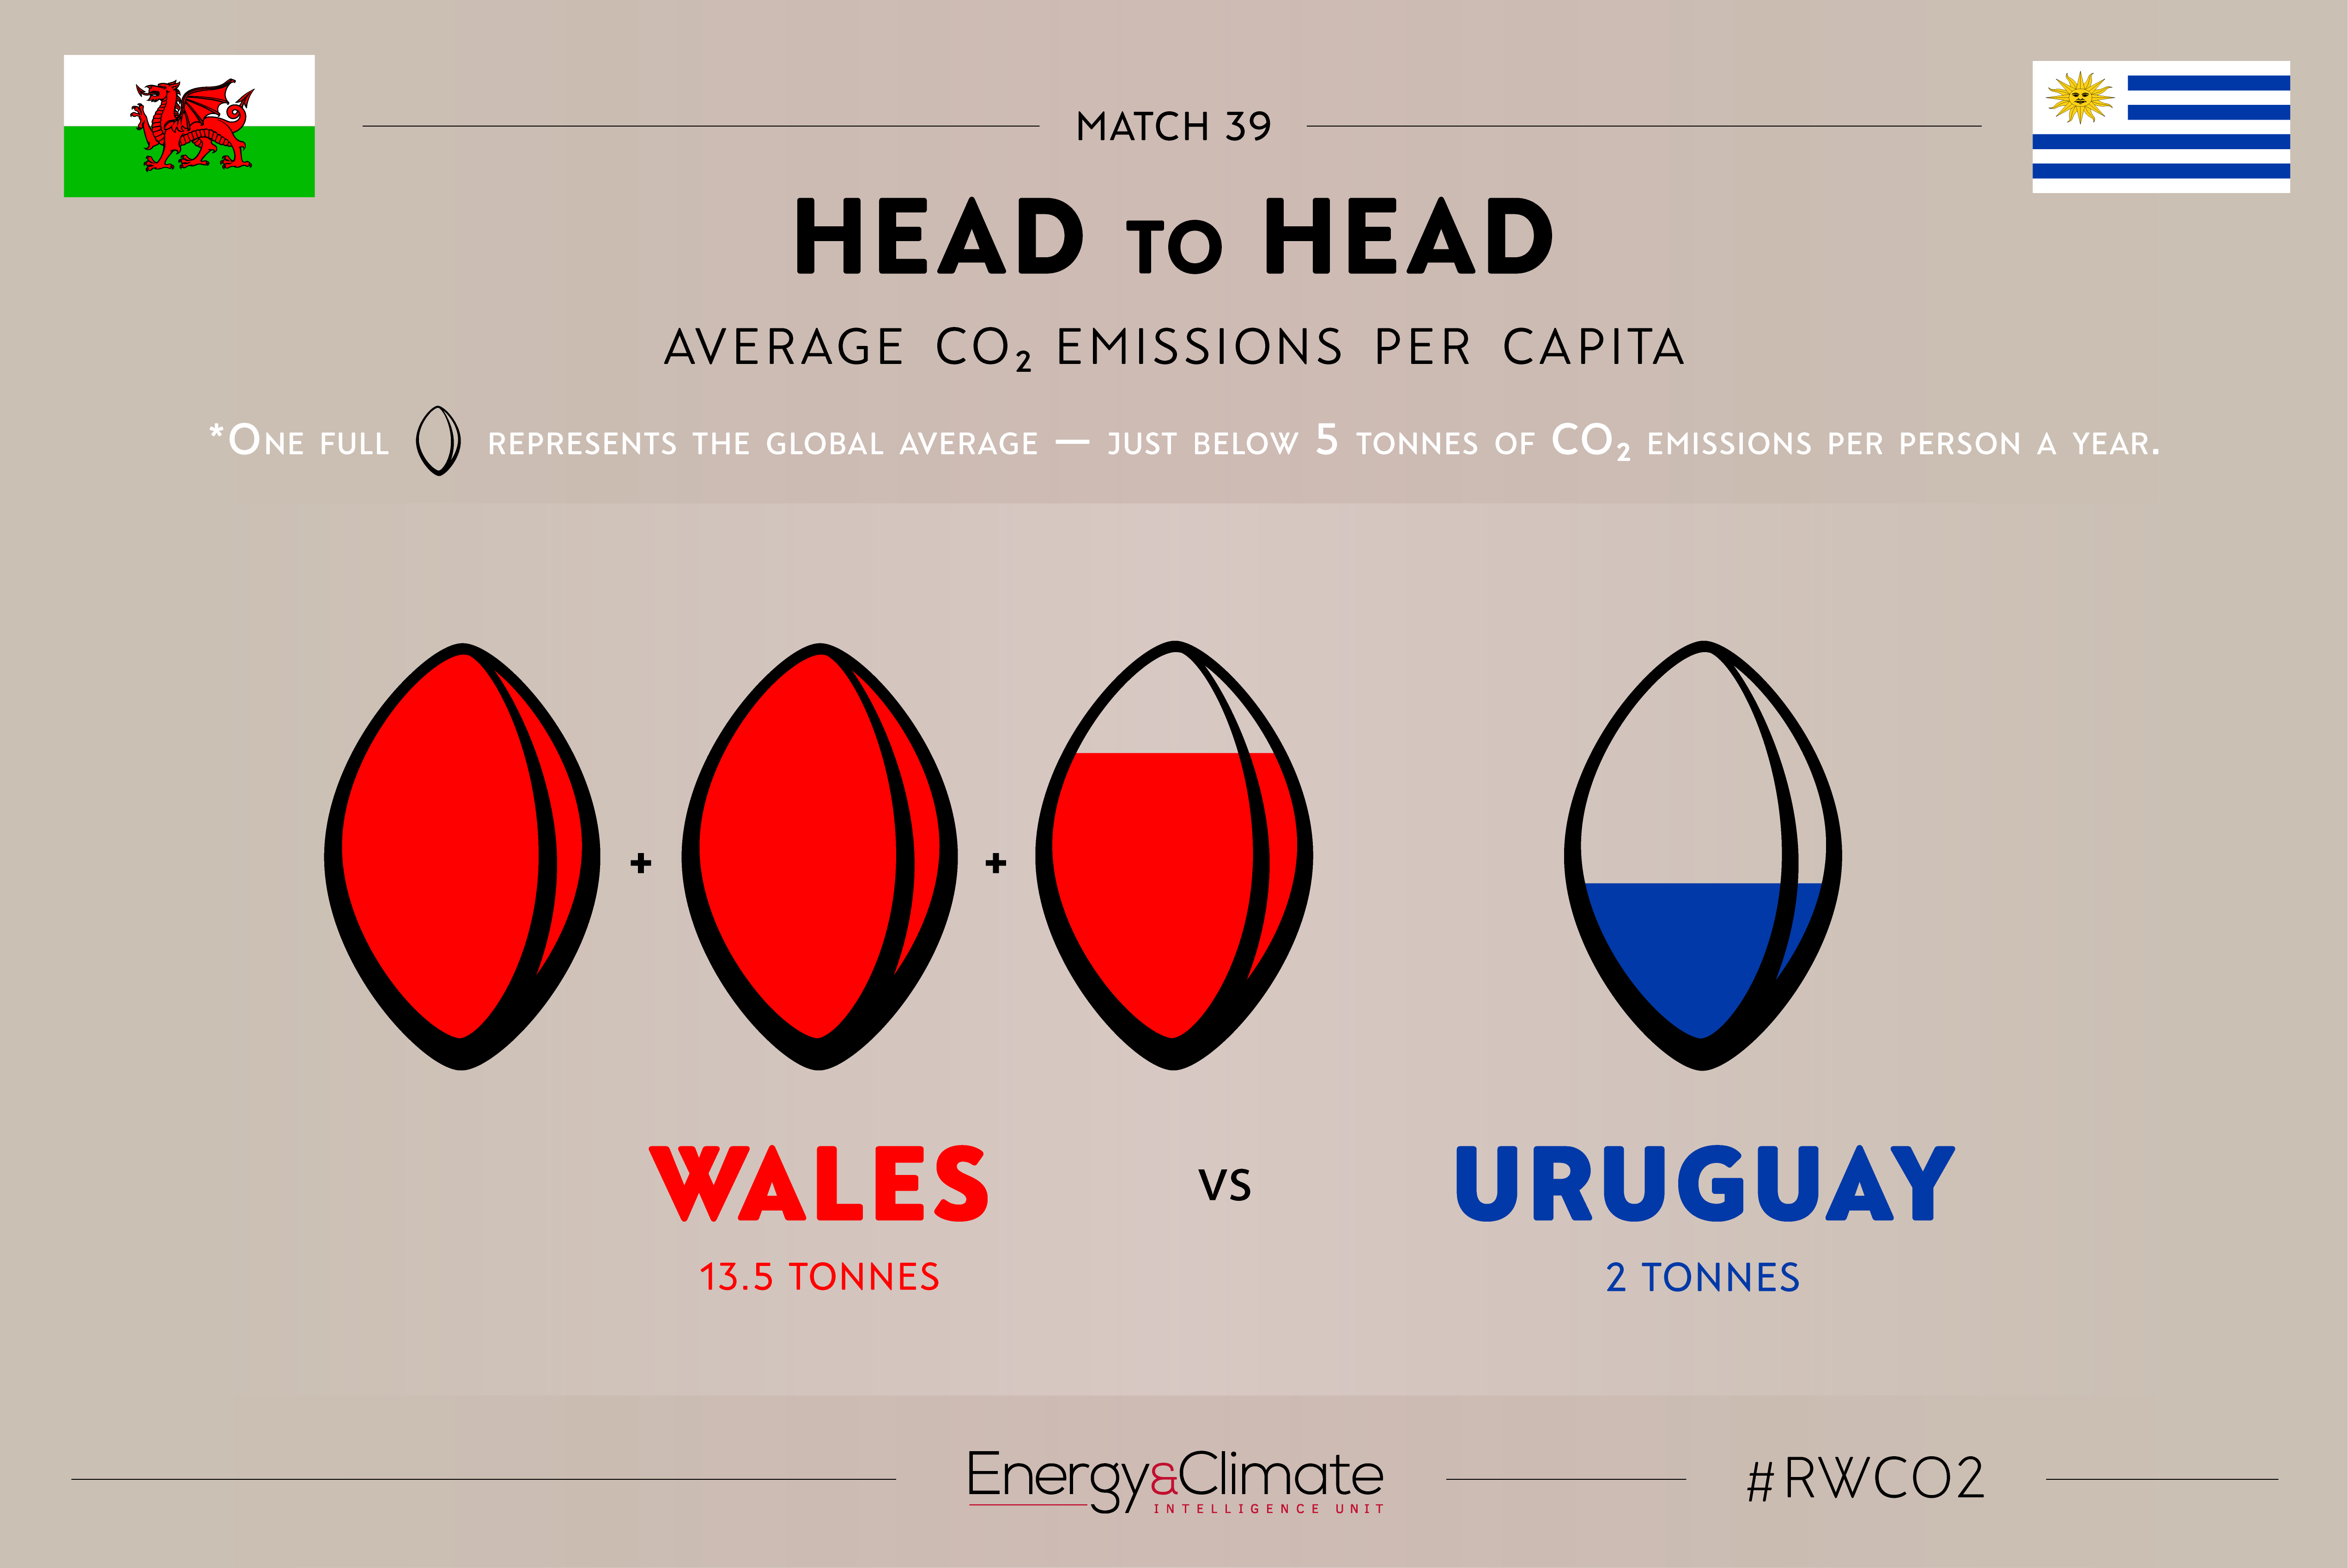 Wales v Uruguay - per capita emissions